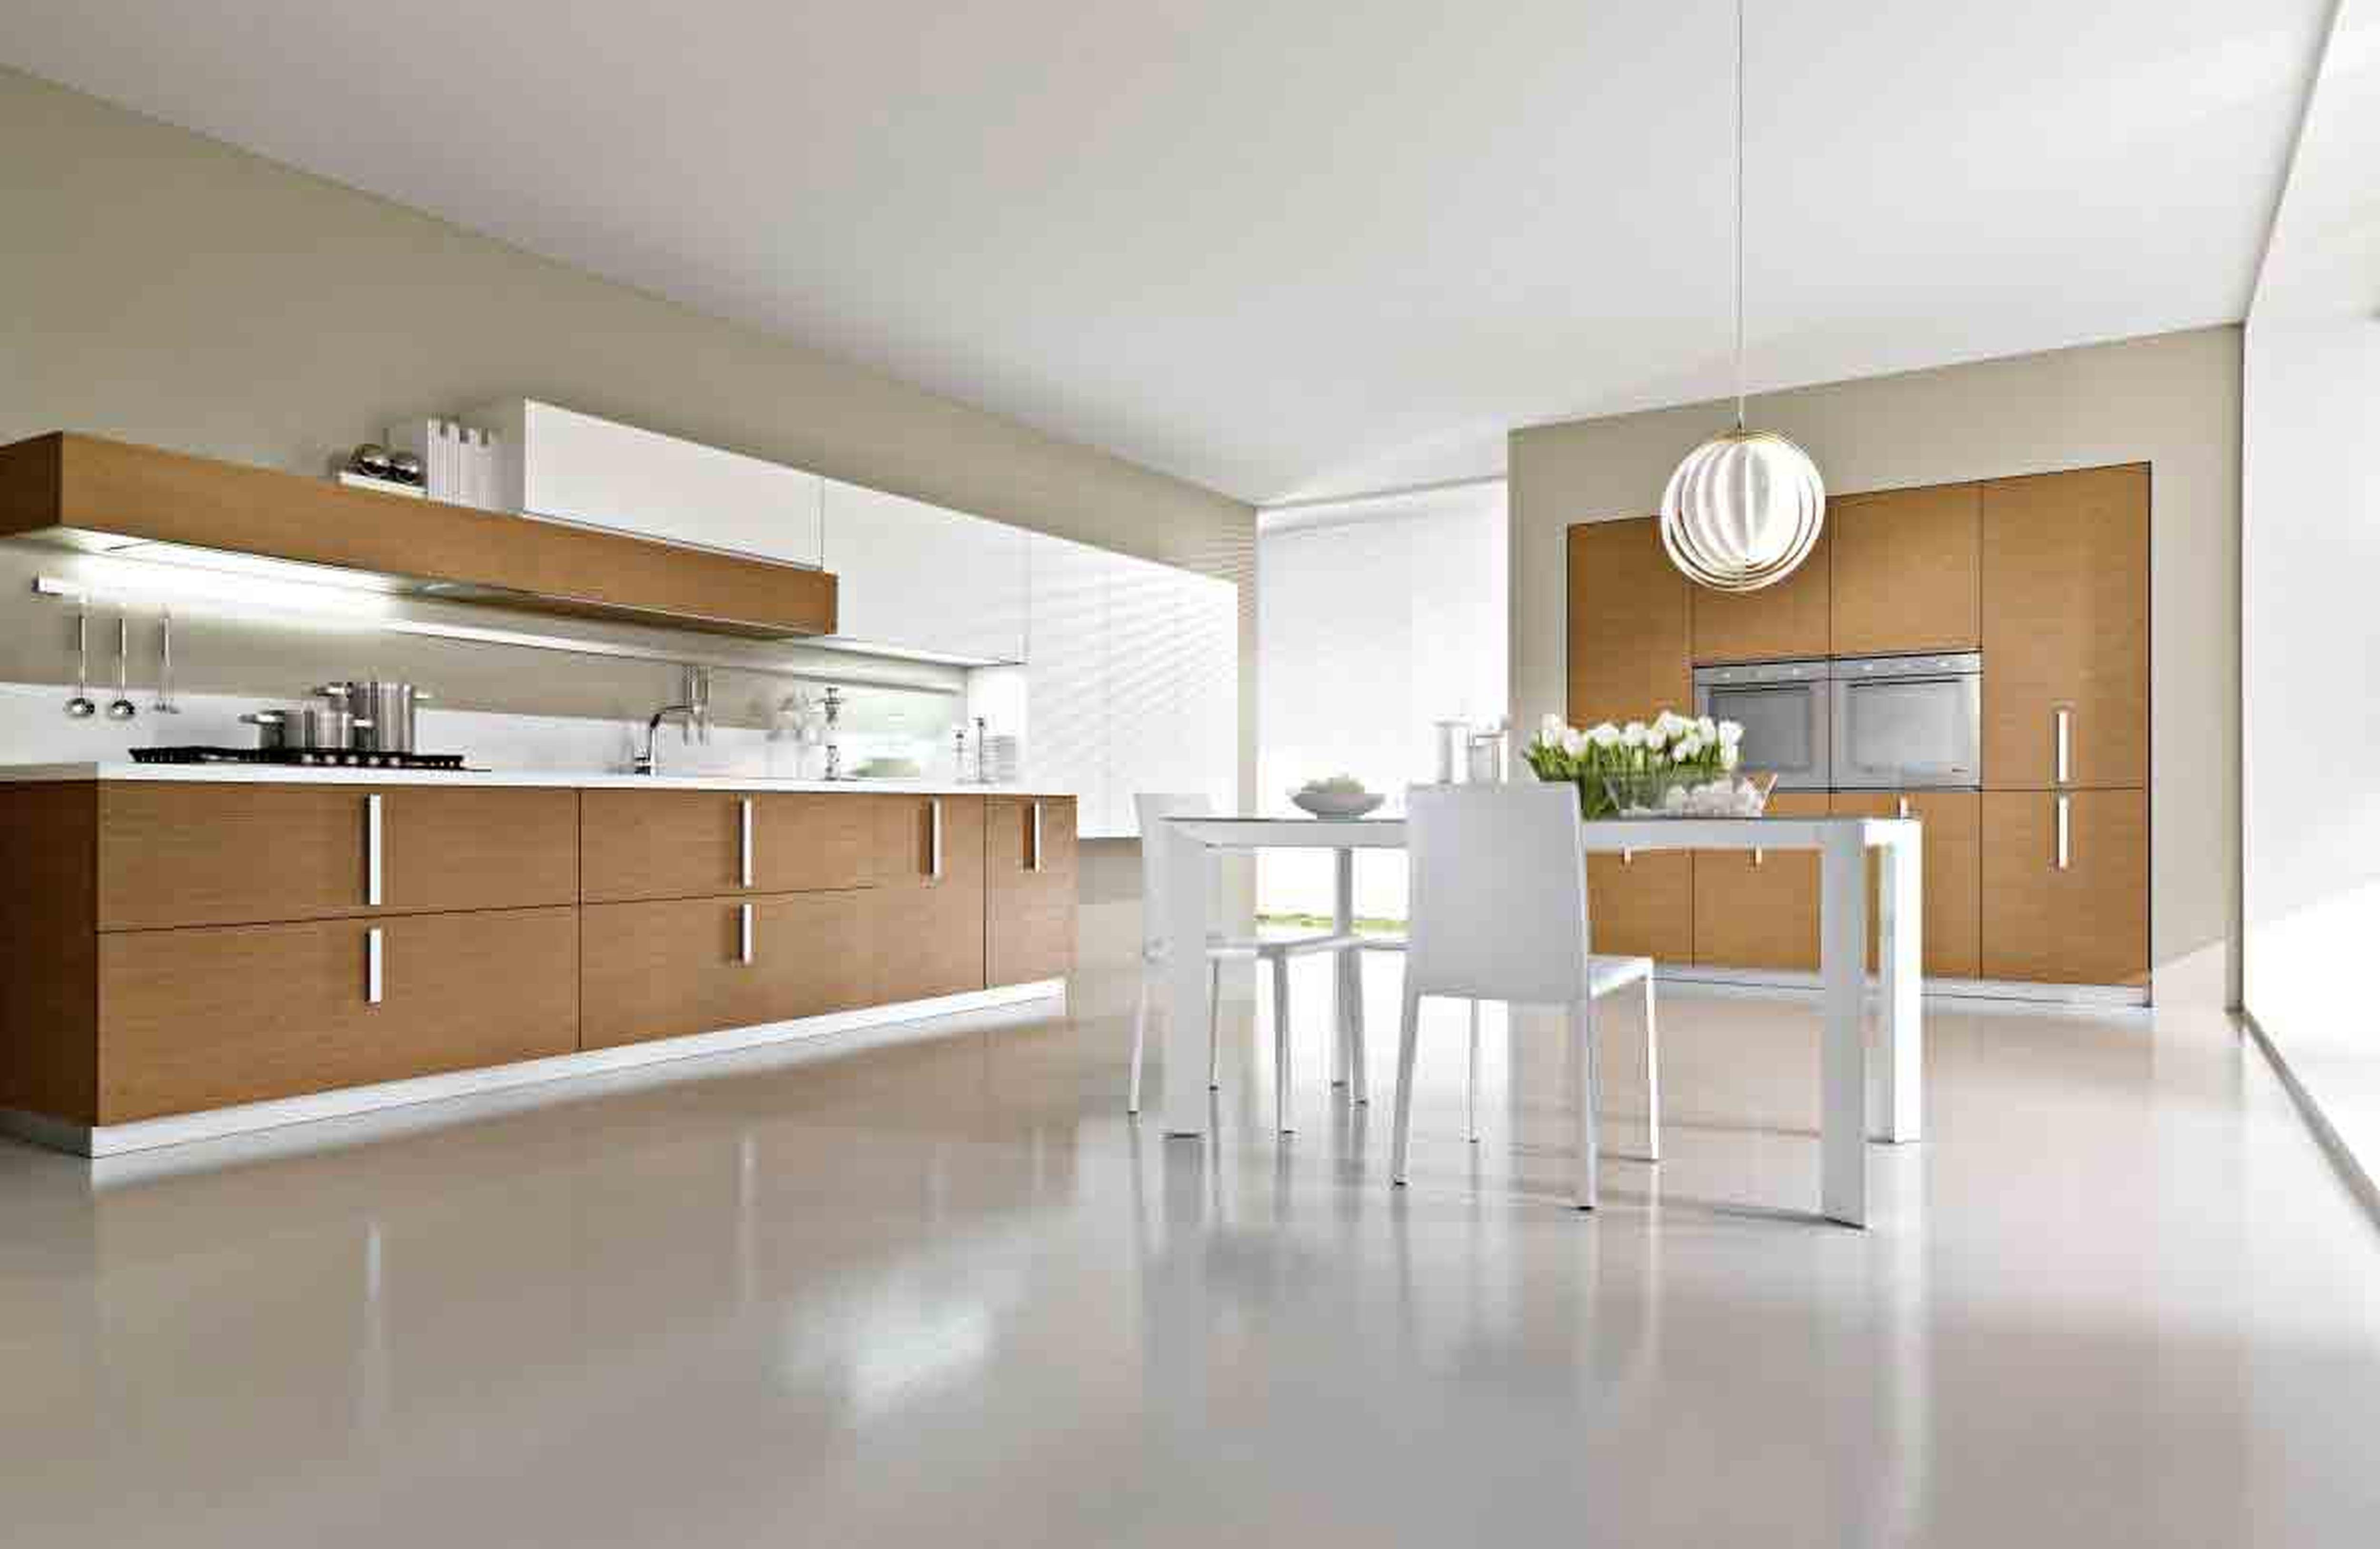 20 impressive kitchen flooring options for your kitchen